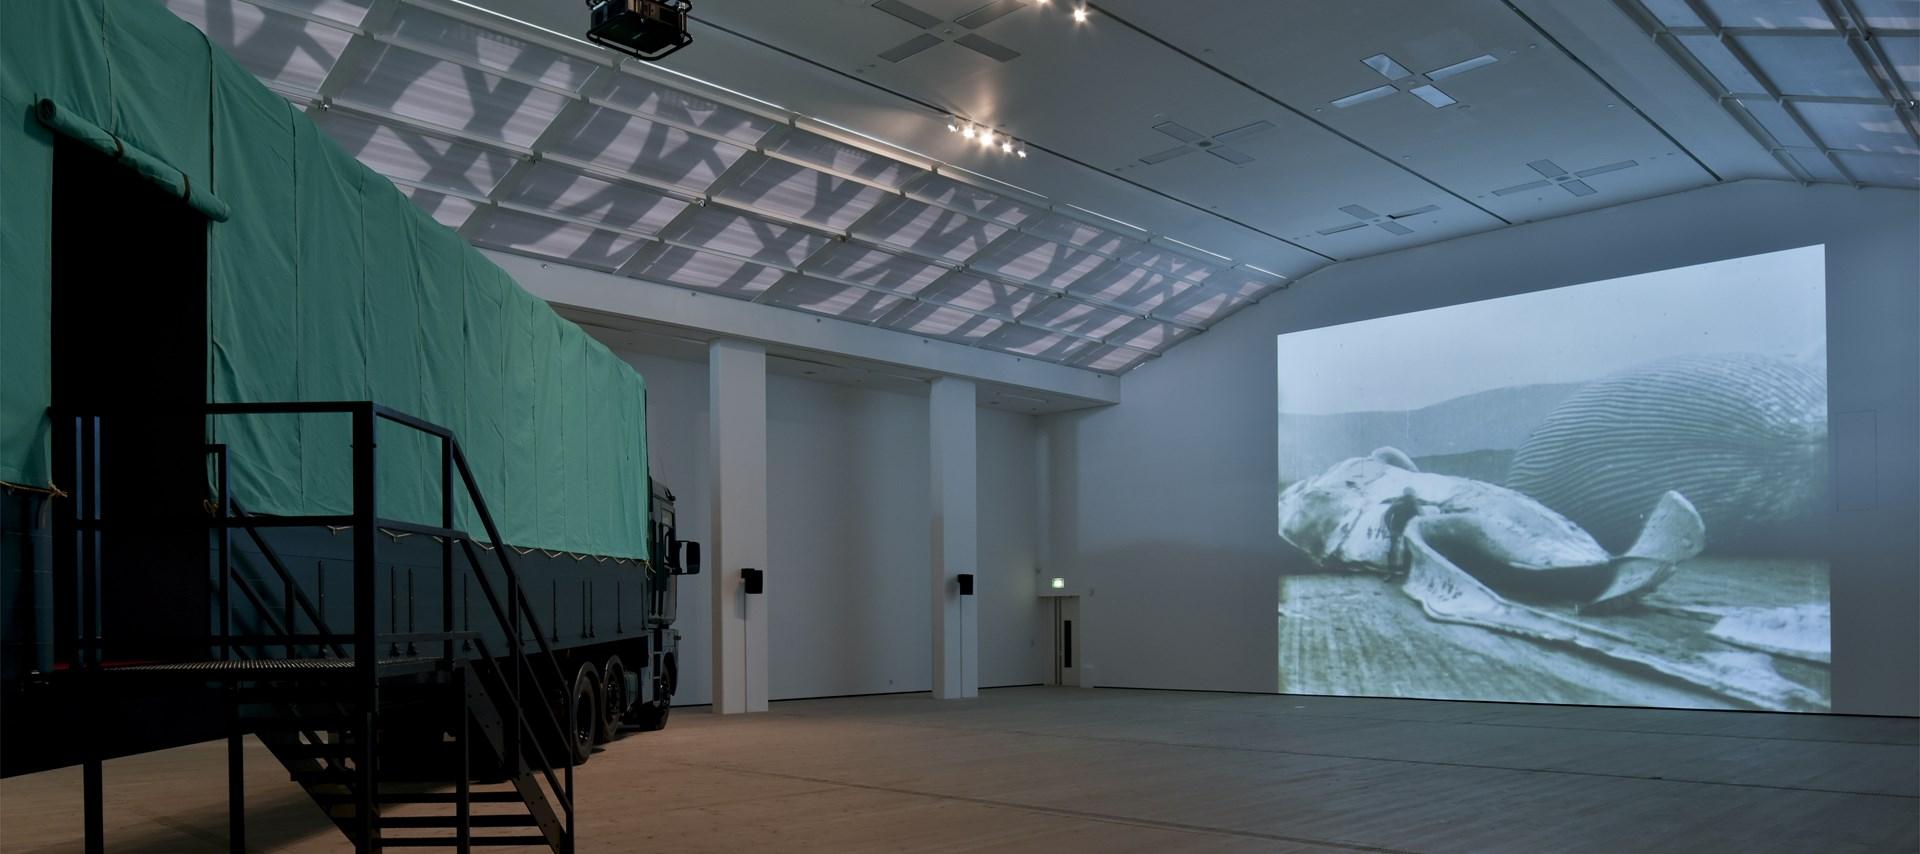 Fiona Tan_Leviathan, Installation View. © 2015, BALTIC/Jonty Wilde